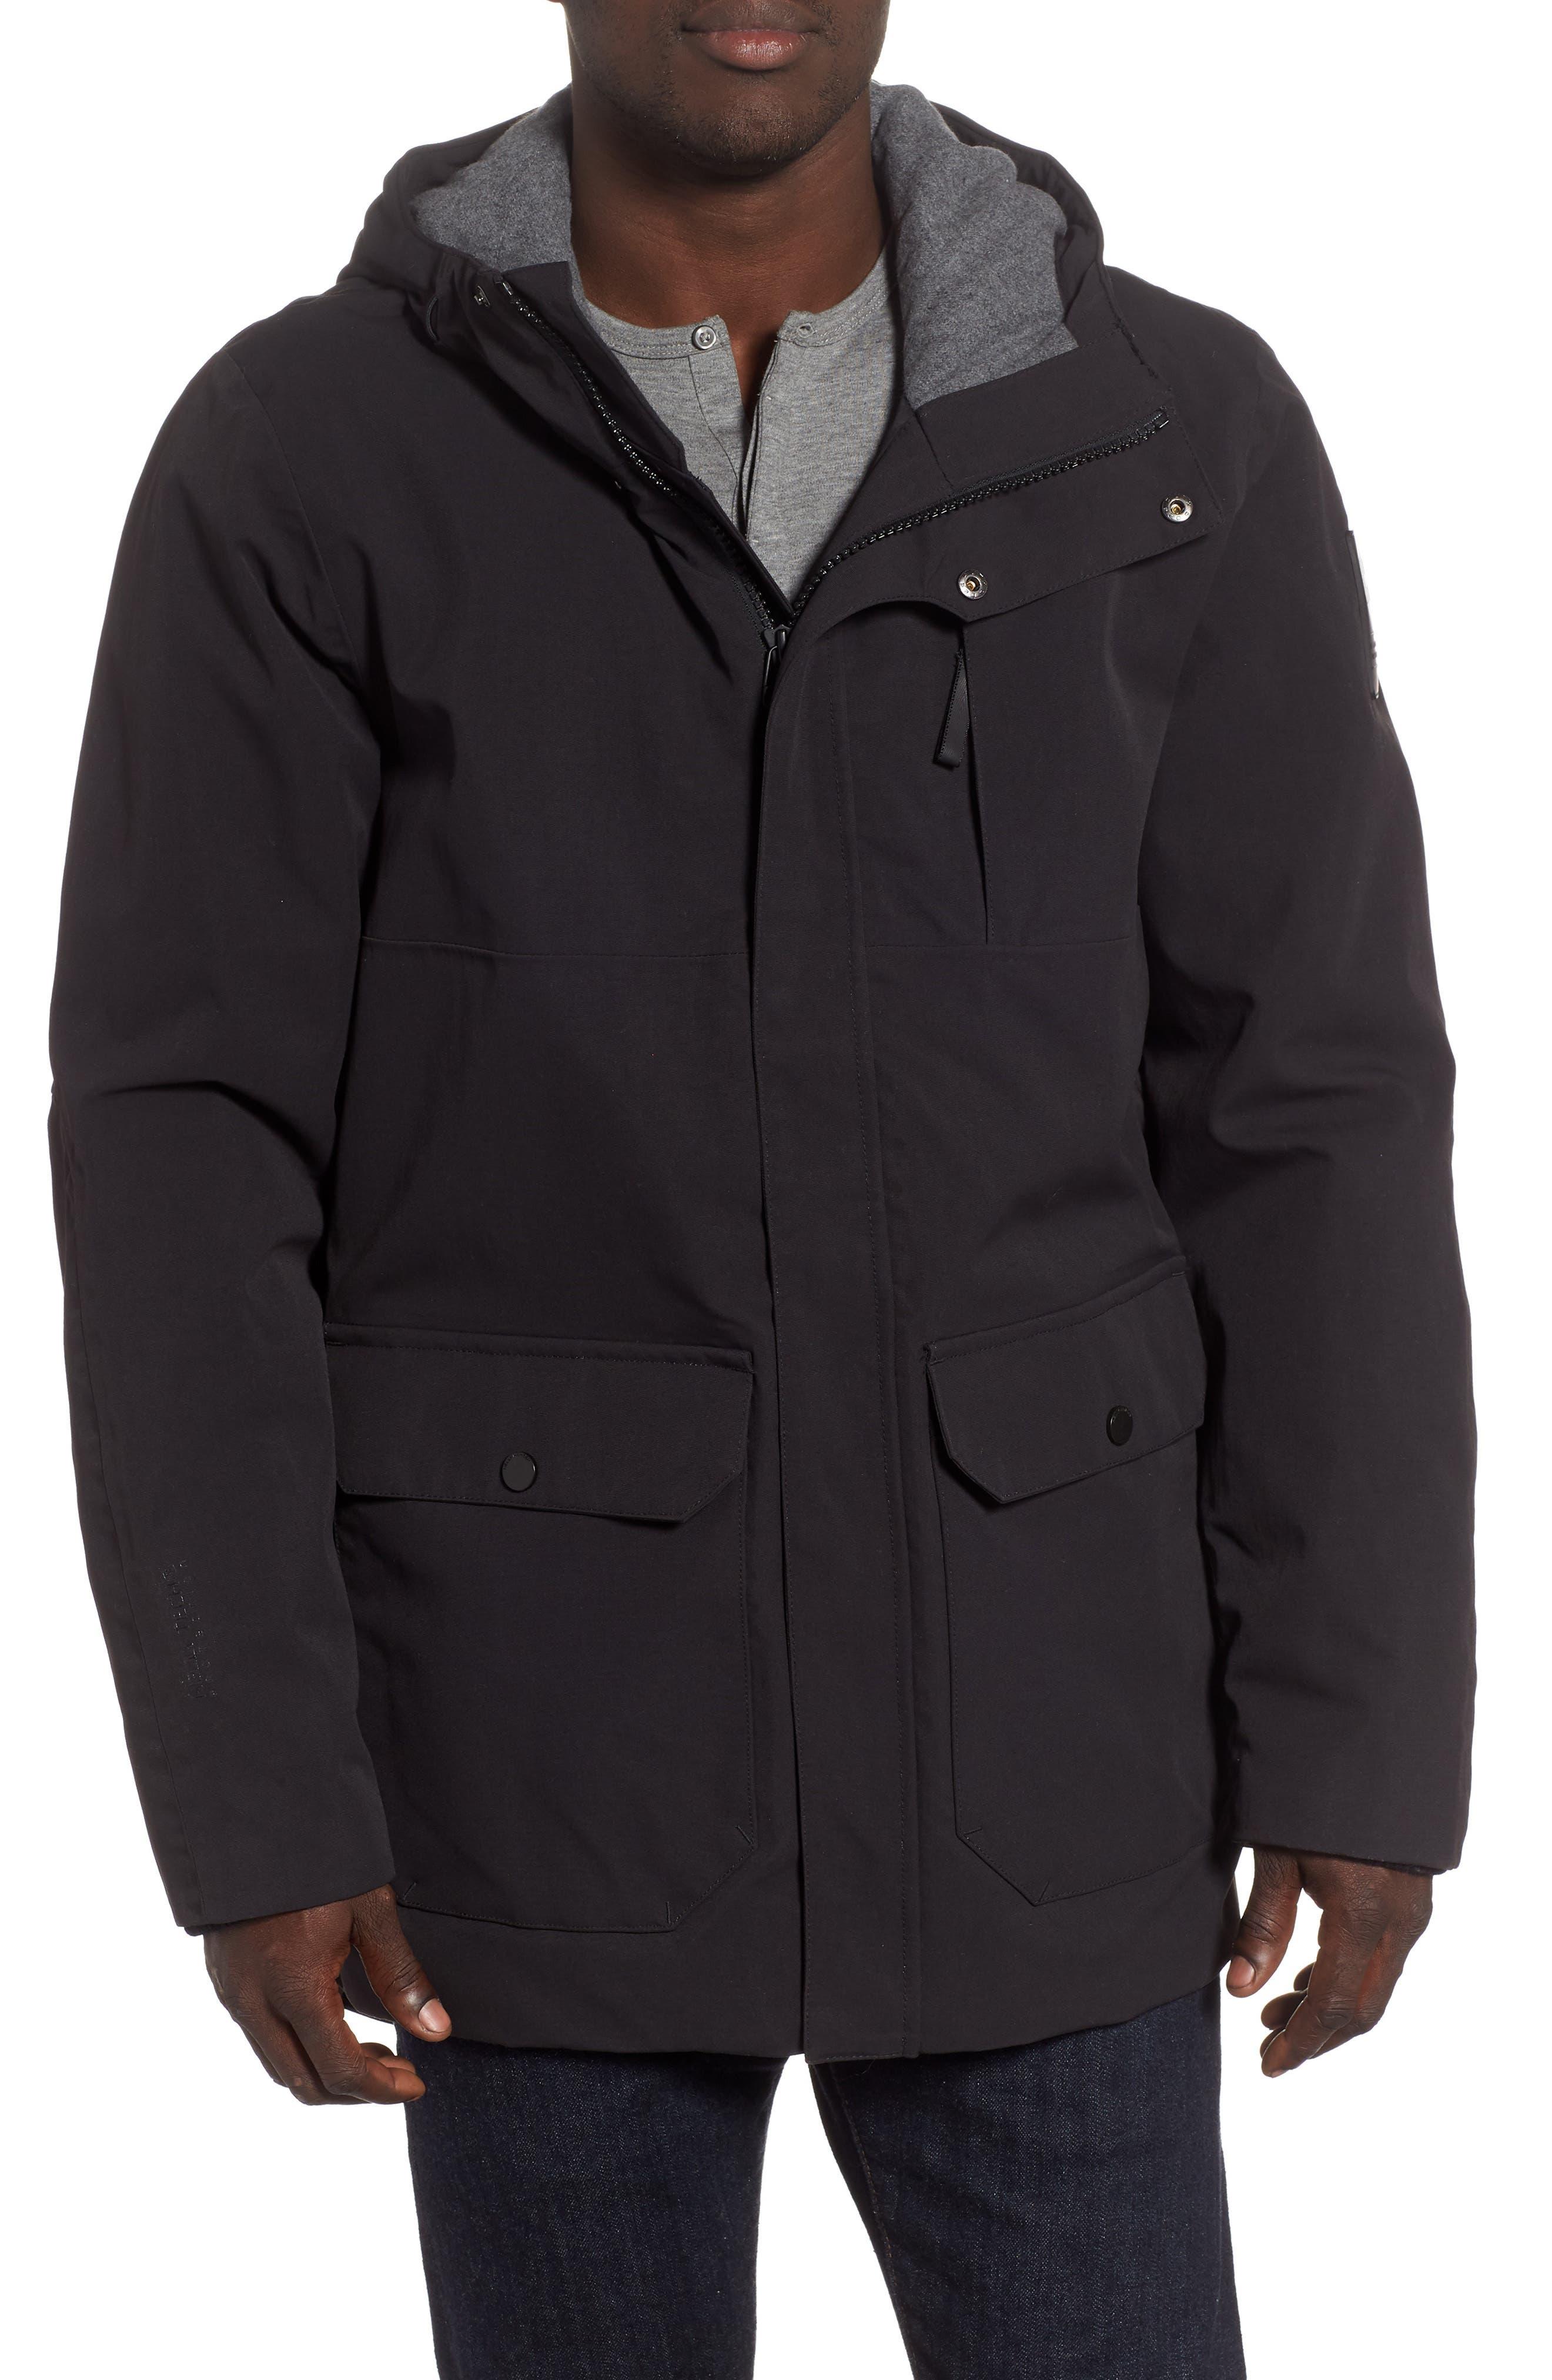 Helly Hansen Urban Windproof & Waterproof Primaloft Long Jacket, Black